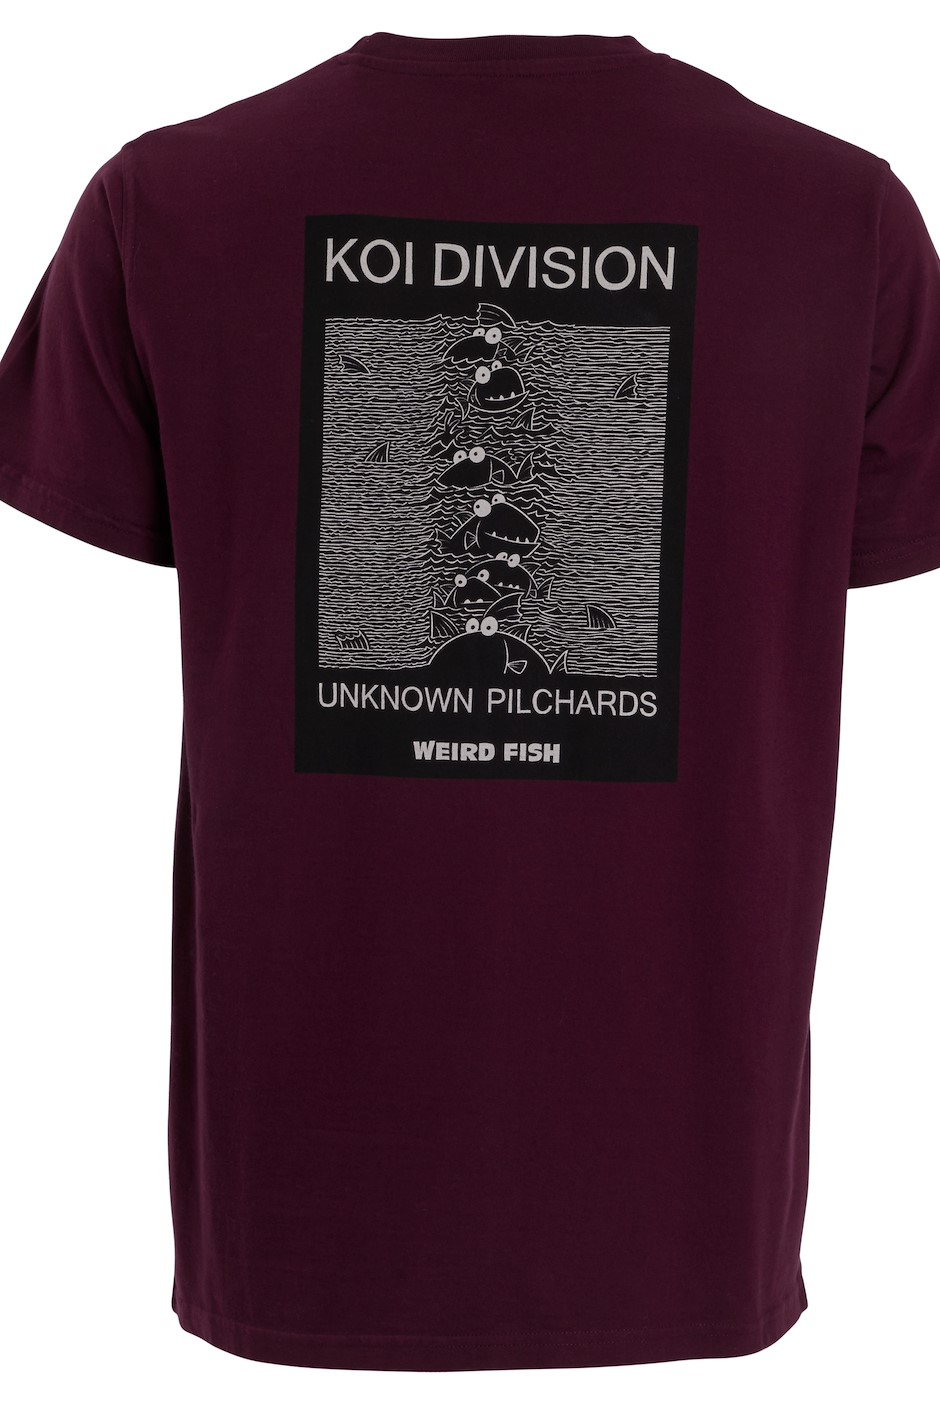 Koi Division Artist T-Shirt Plum